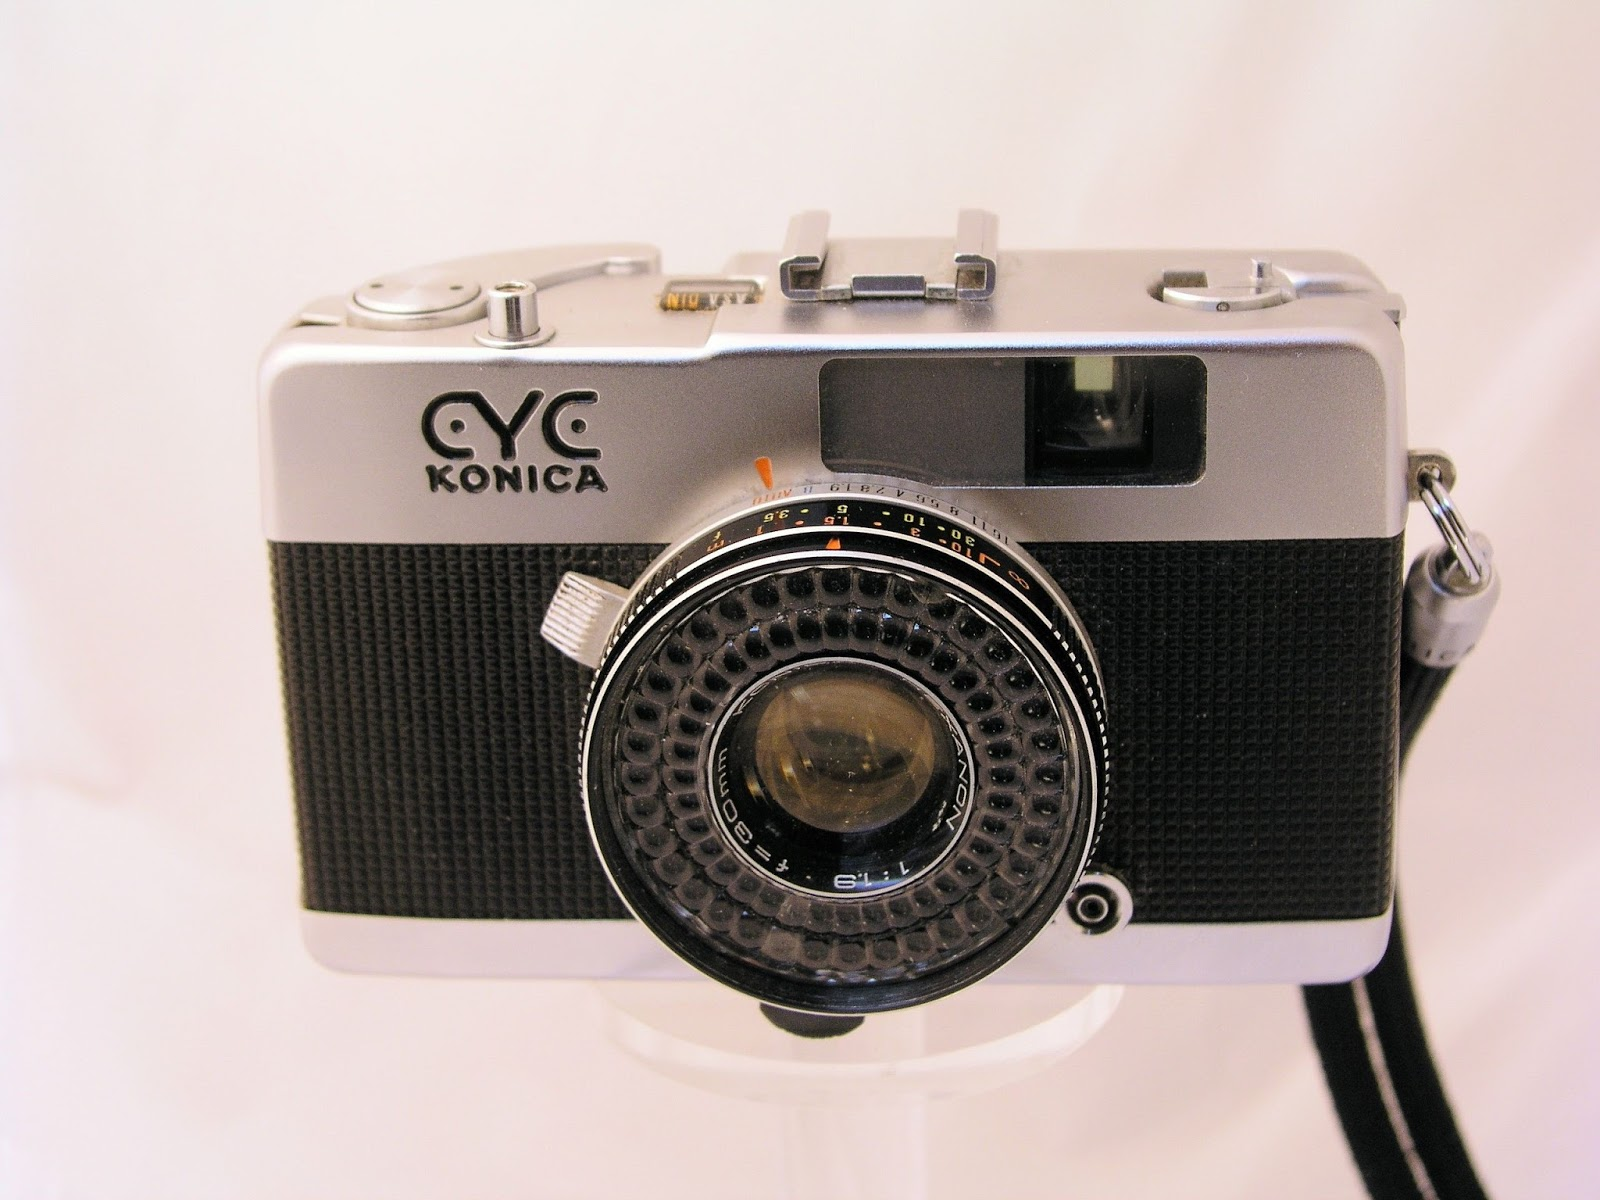 Eyeglass Frame Camera : Random Camera Blog: A Look Through the Konica EYE